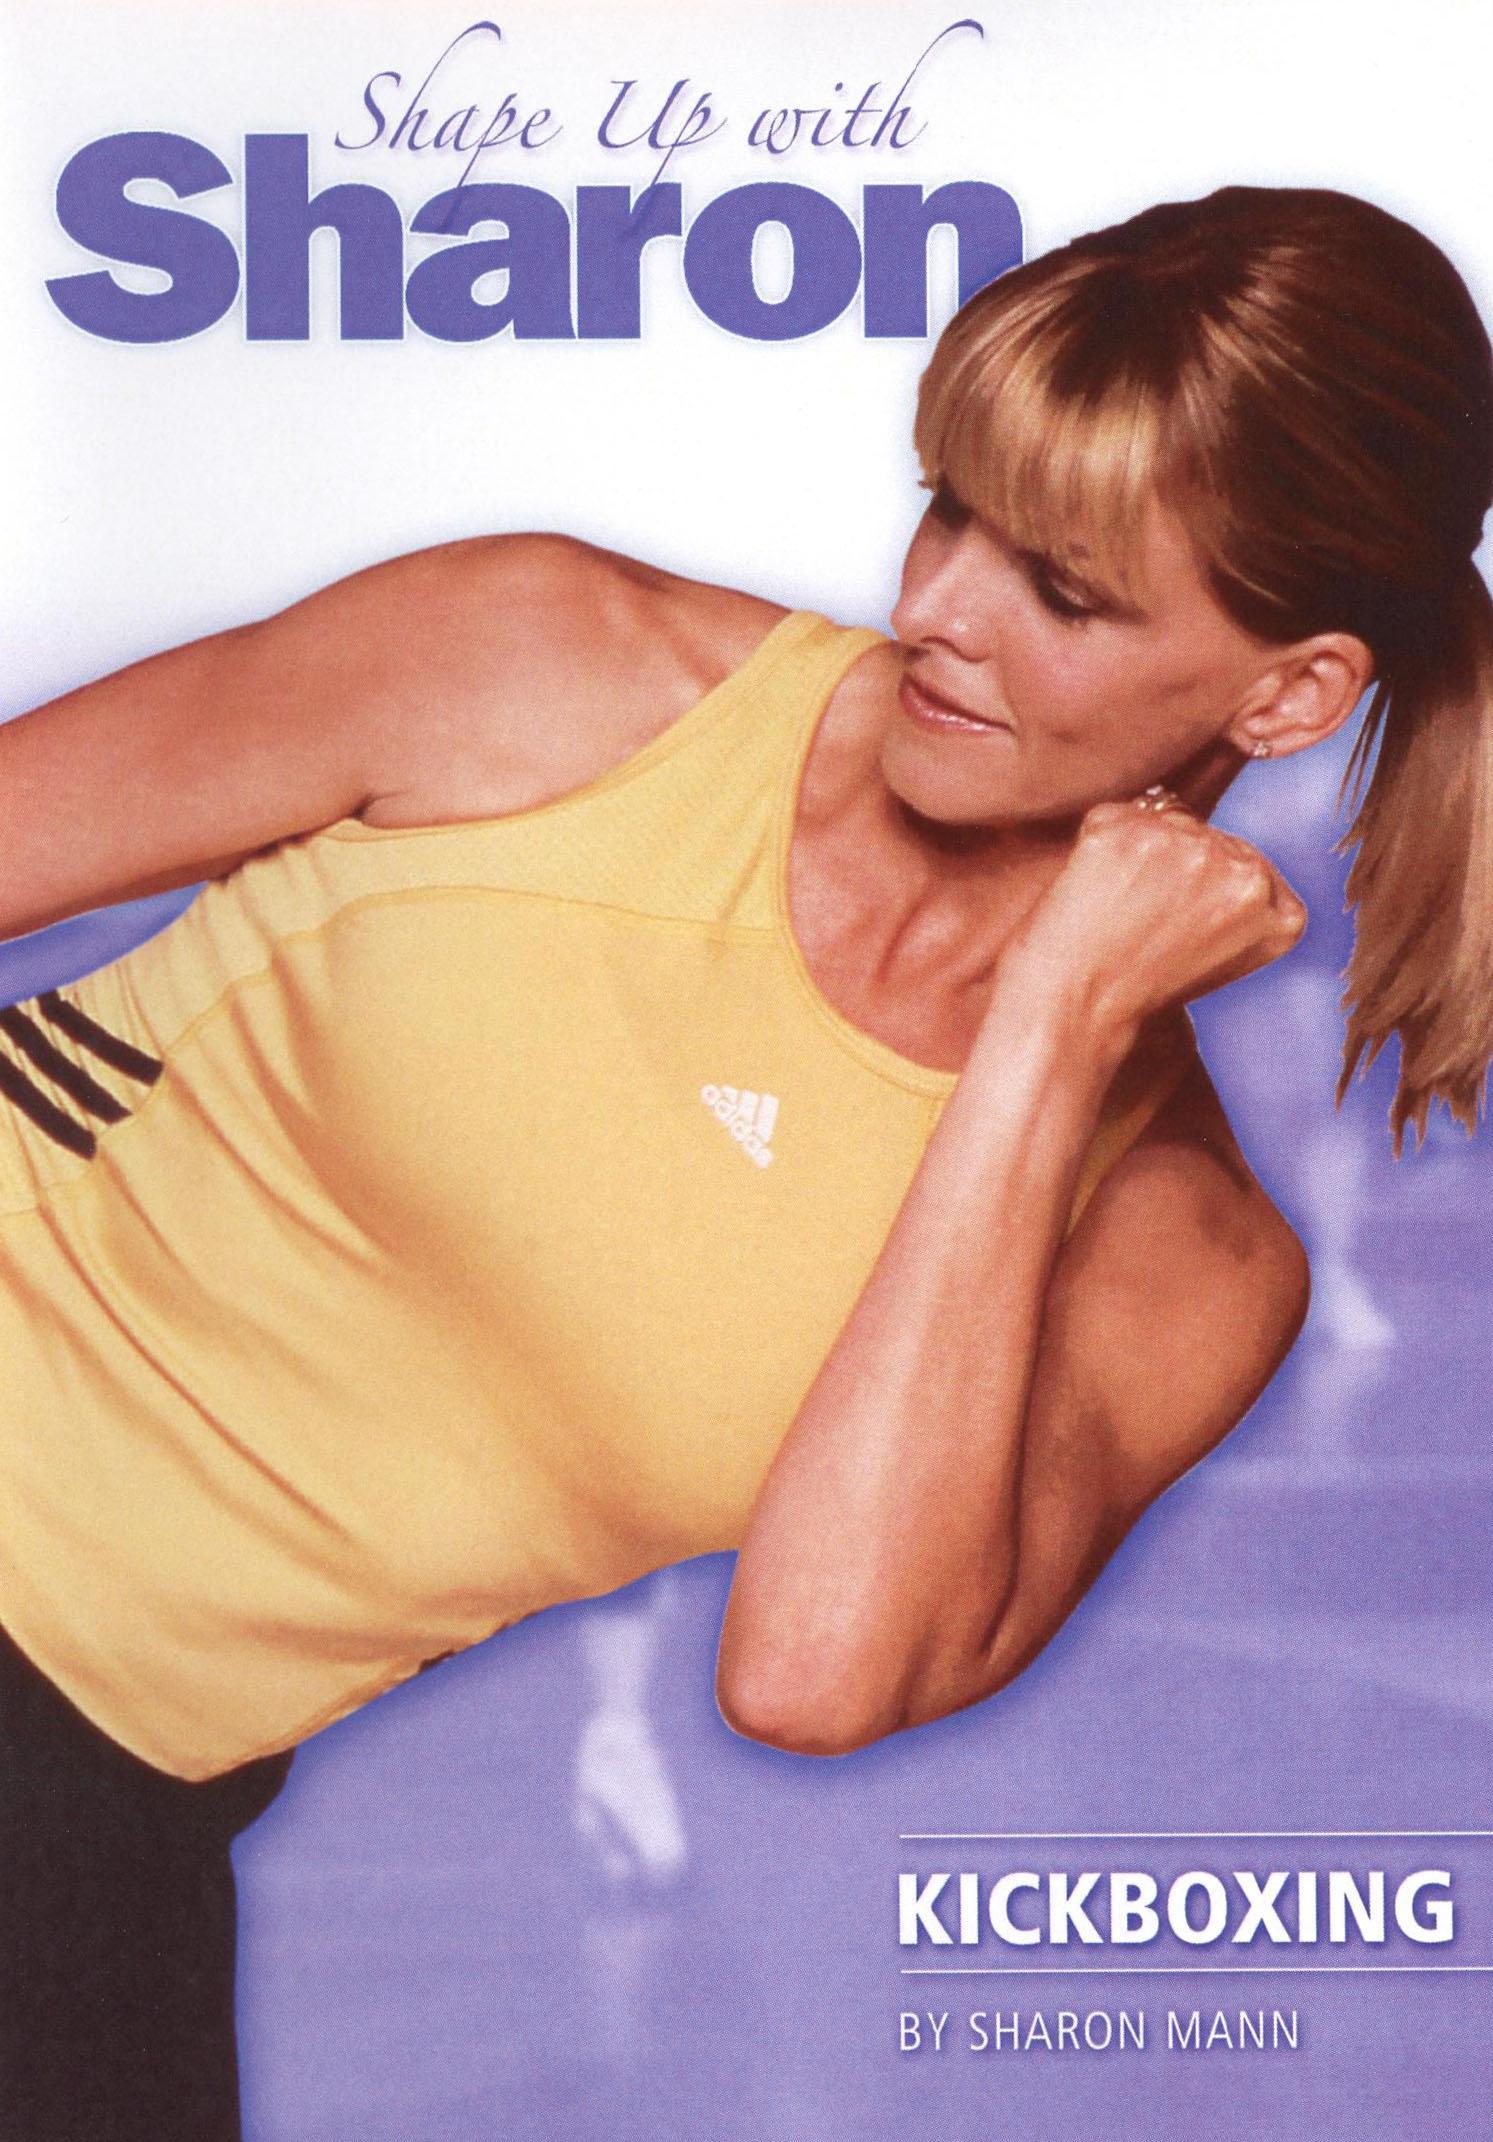 Sharon Mann: Shape Up With Sharon - Kickboxing